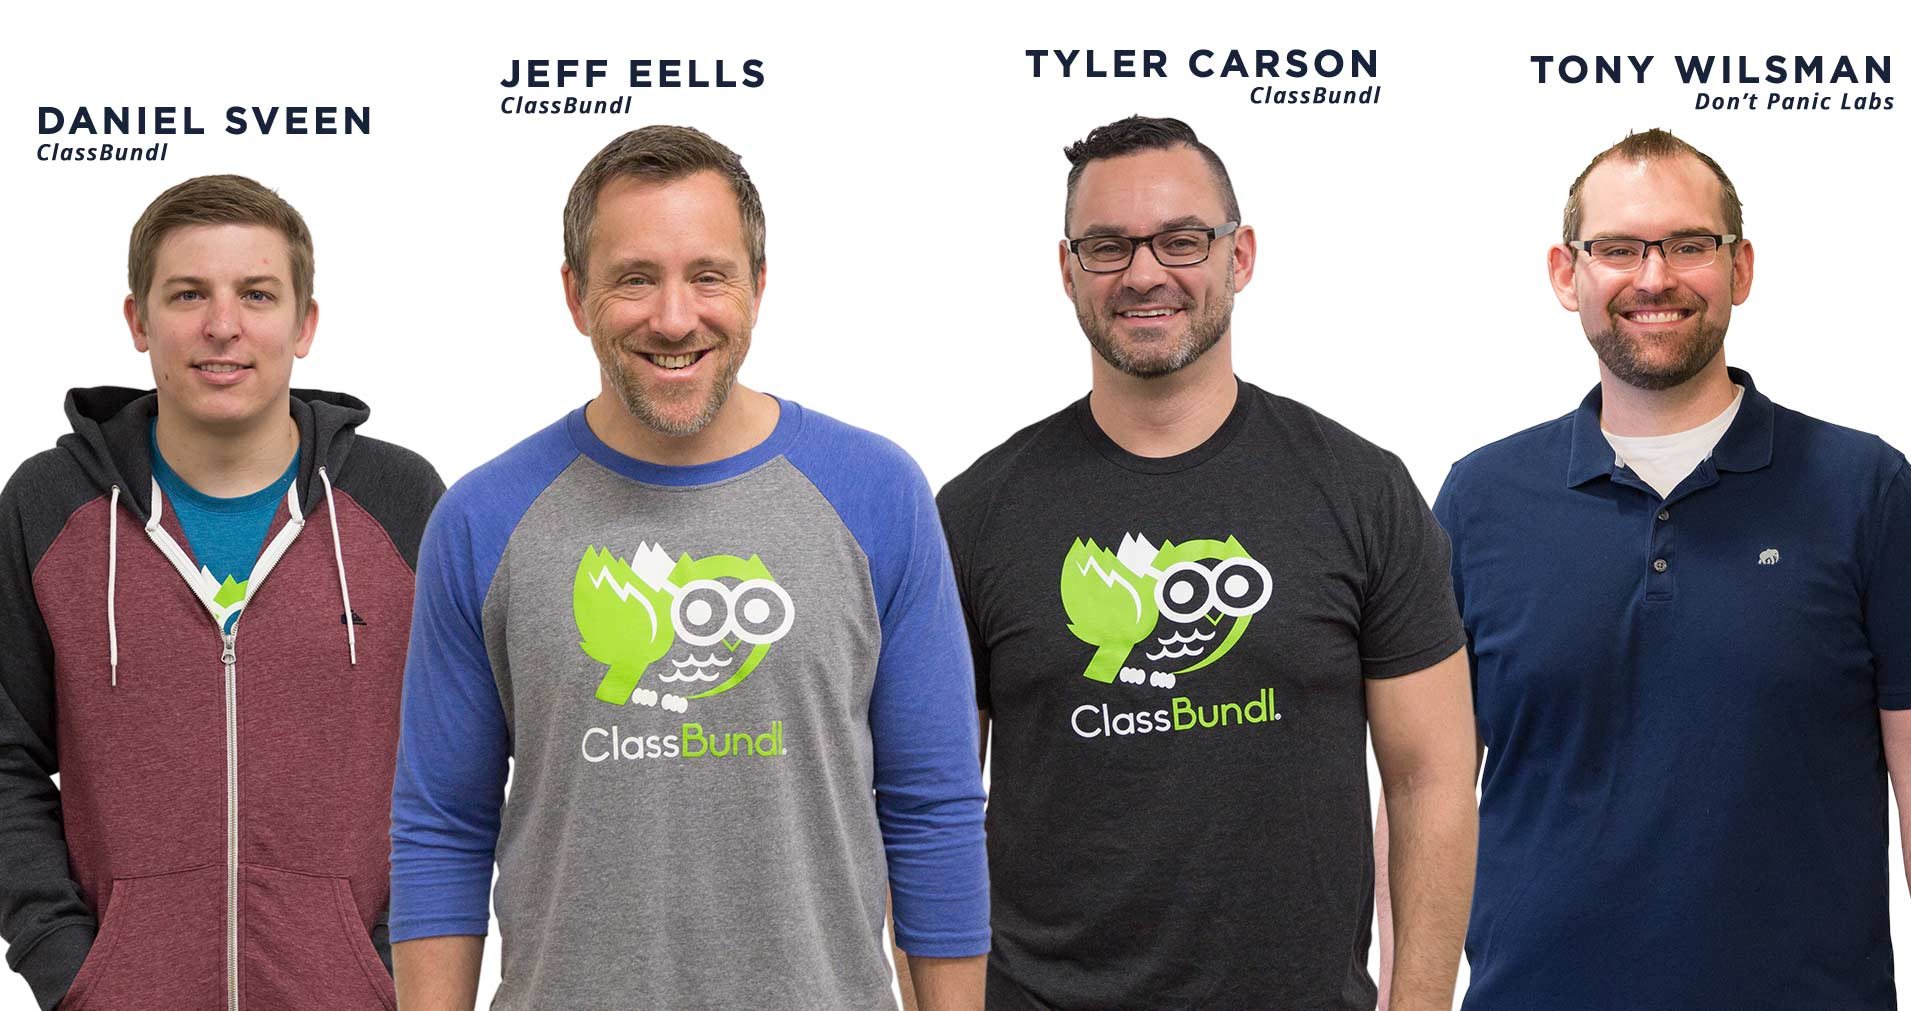 Daniel Sveen, Jeff Eels, and Tyler Carson of ClassBundl, and Tony Wilsman of Don't Panic Labs